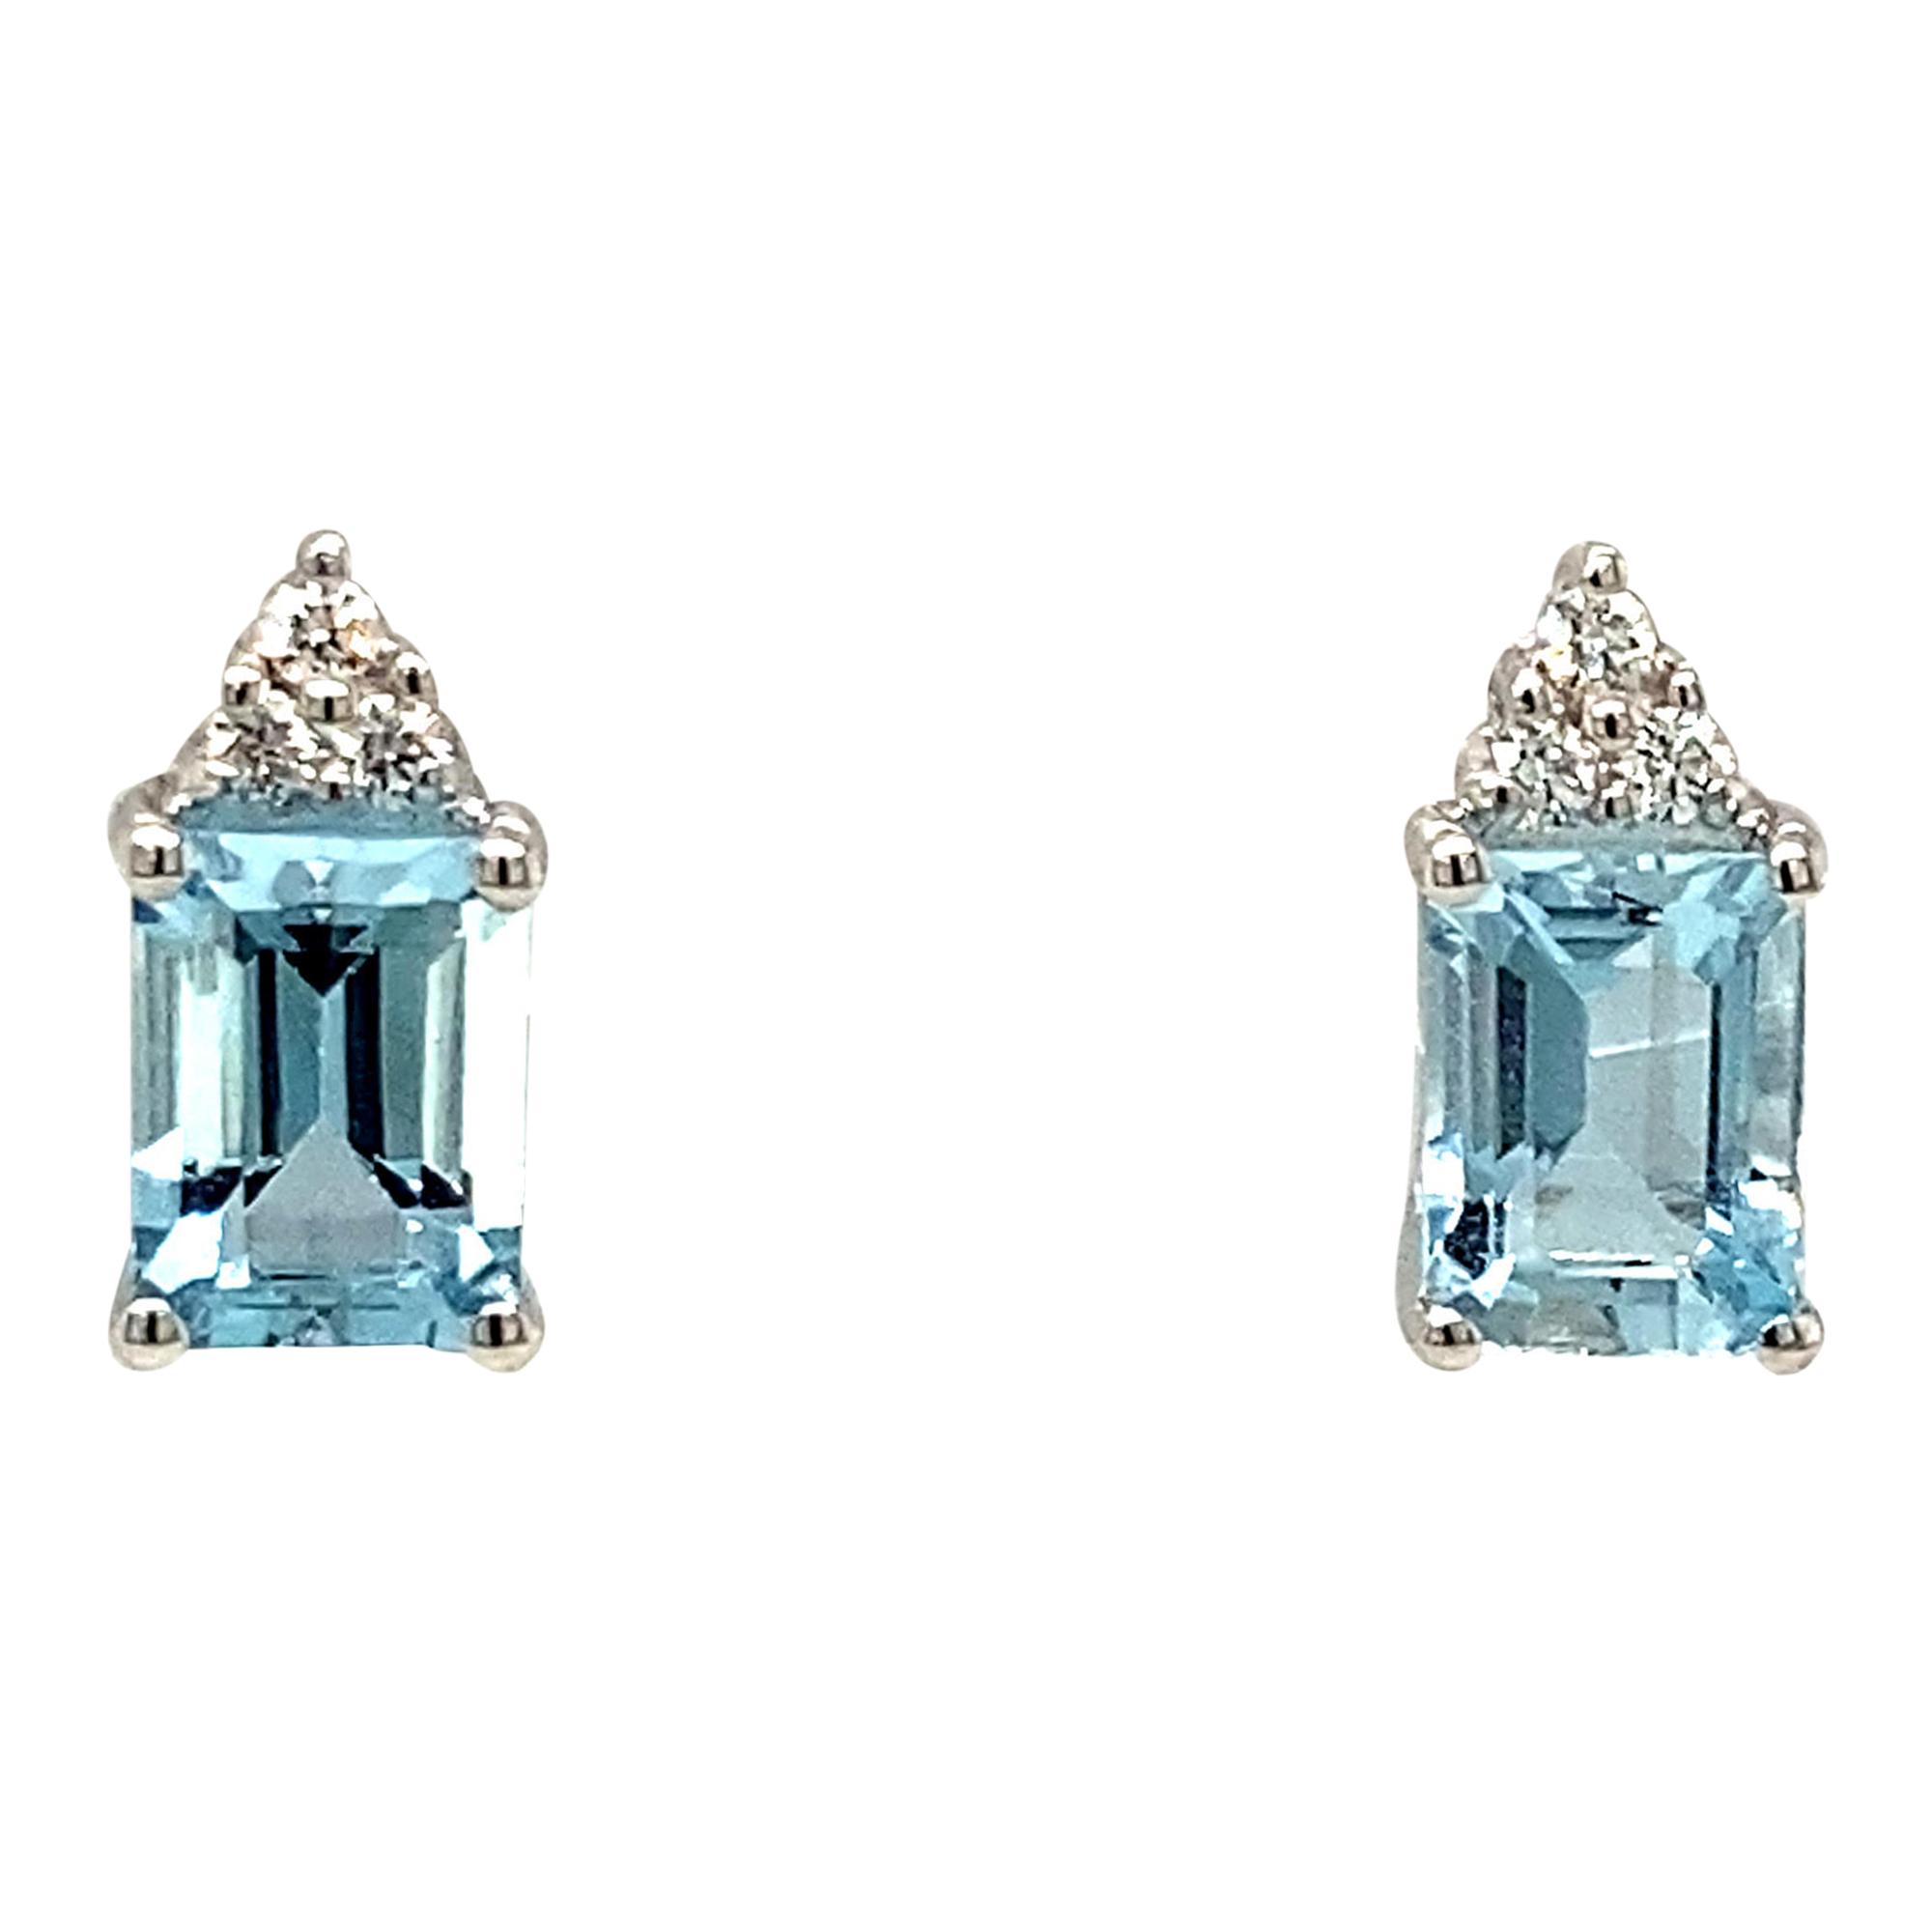 Octagon Cut Aquamarine & Diamond Trefoil 18ct White Gold Earrings